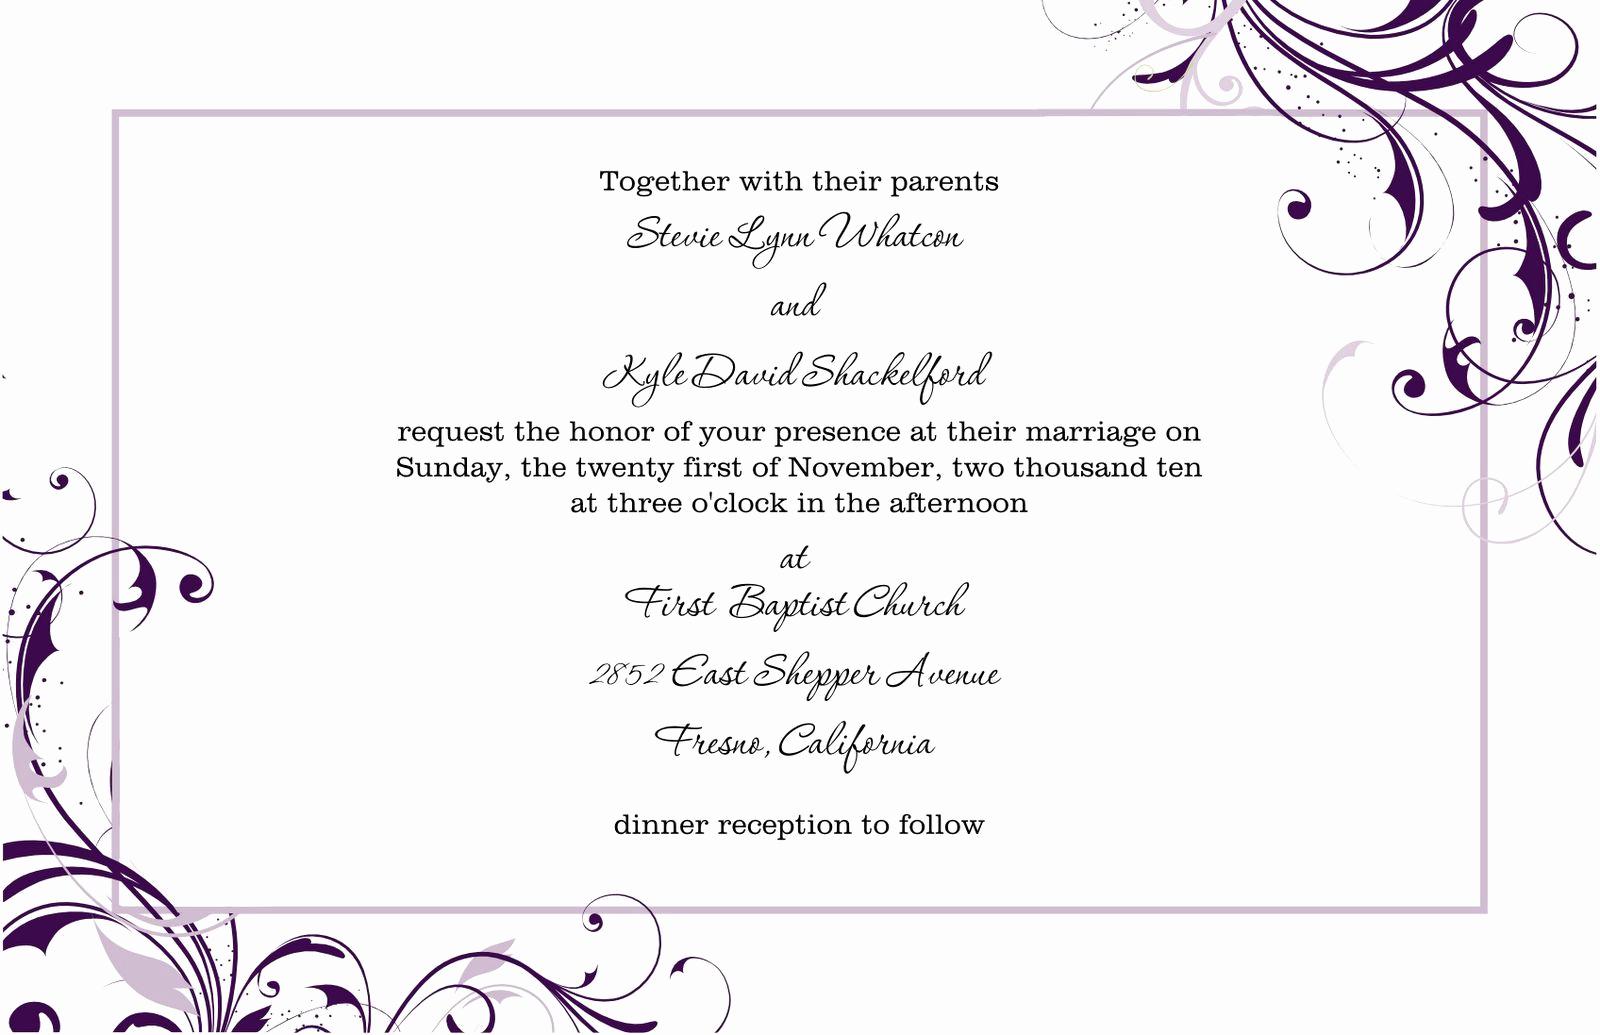 Birthday Invitation Templates Word New Free Blank Wedding Invitation Templates for Microsoft Word